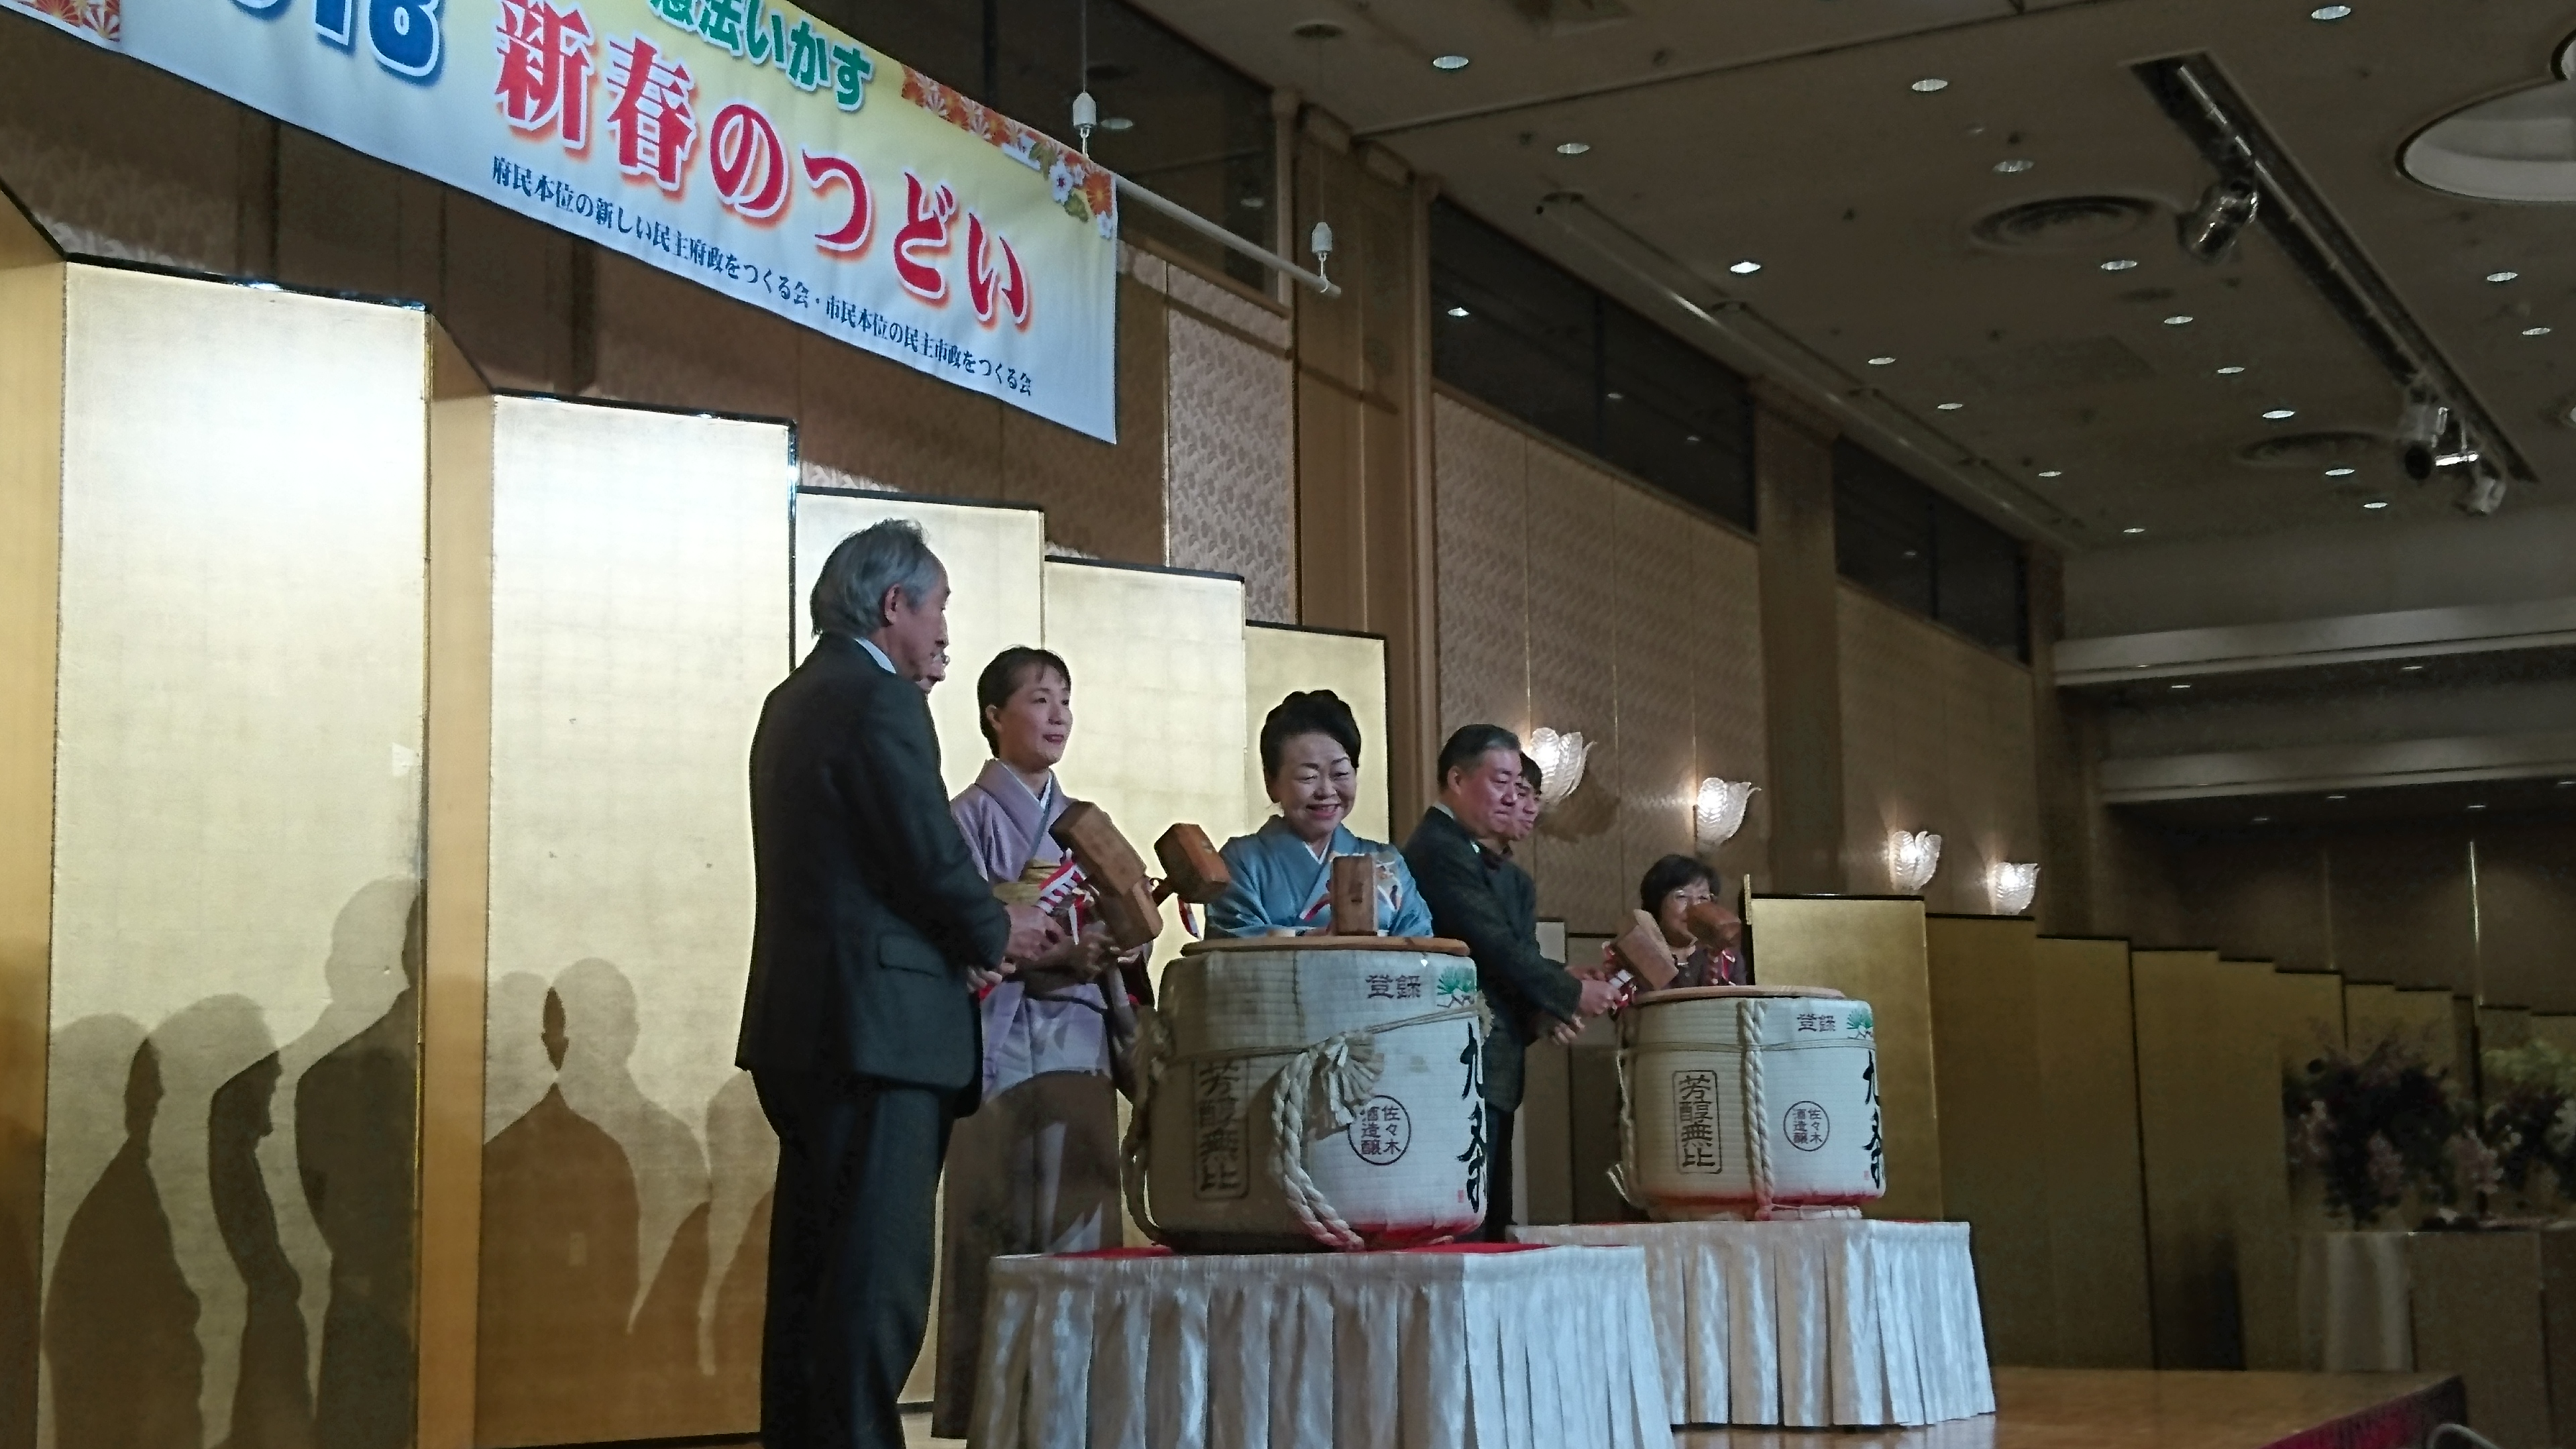 http://www.inoue-satoshi.com/diary/DSC_0642%20%281%29.JPG